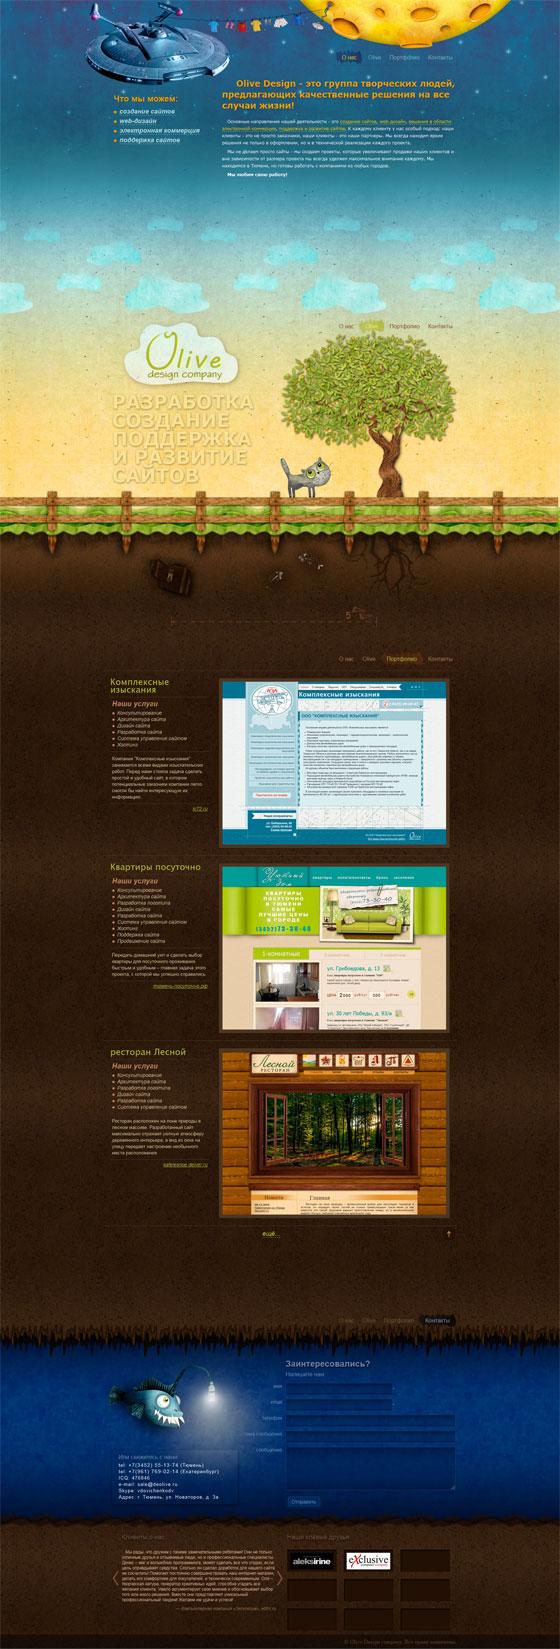 Olive Design Company   Web Designer